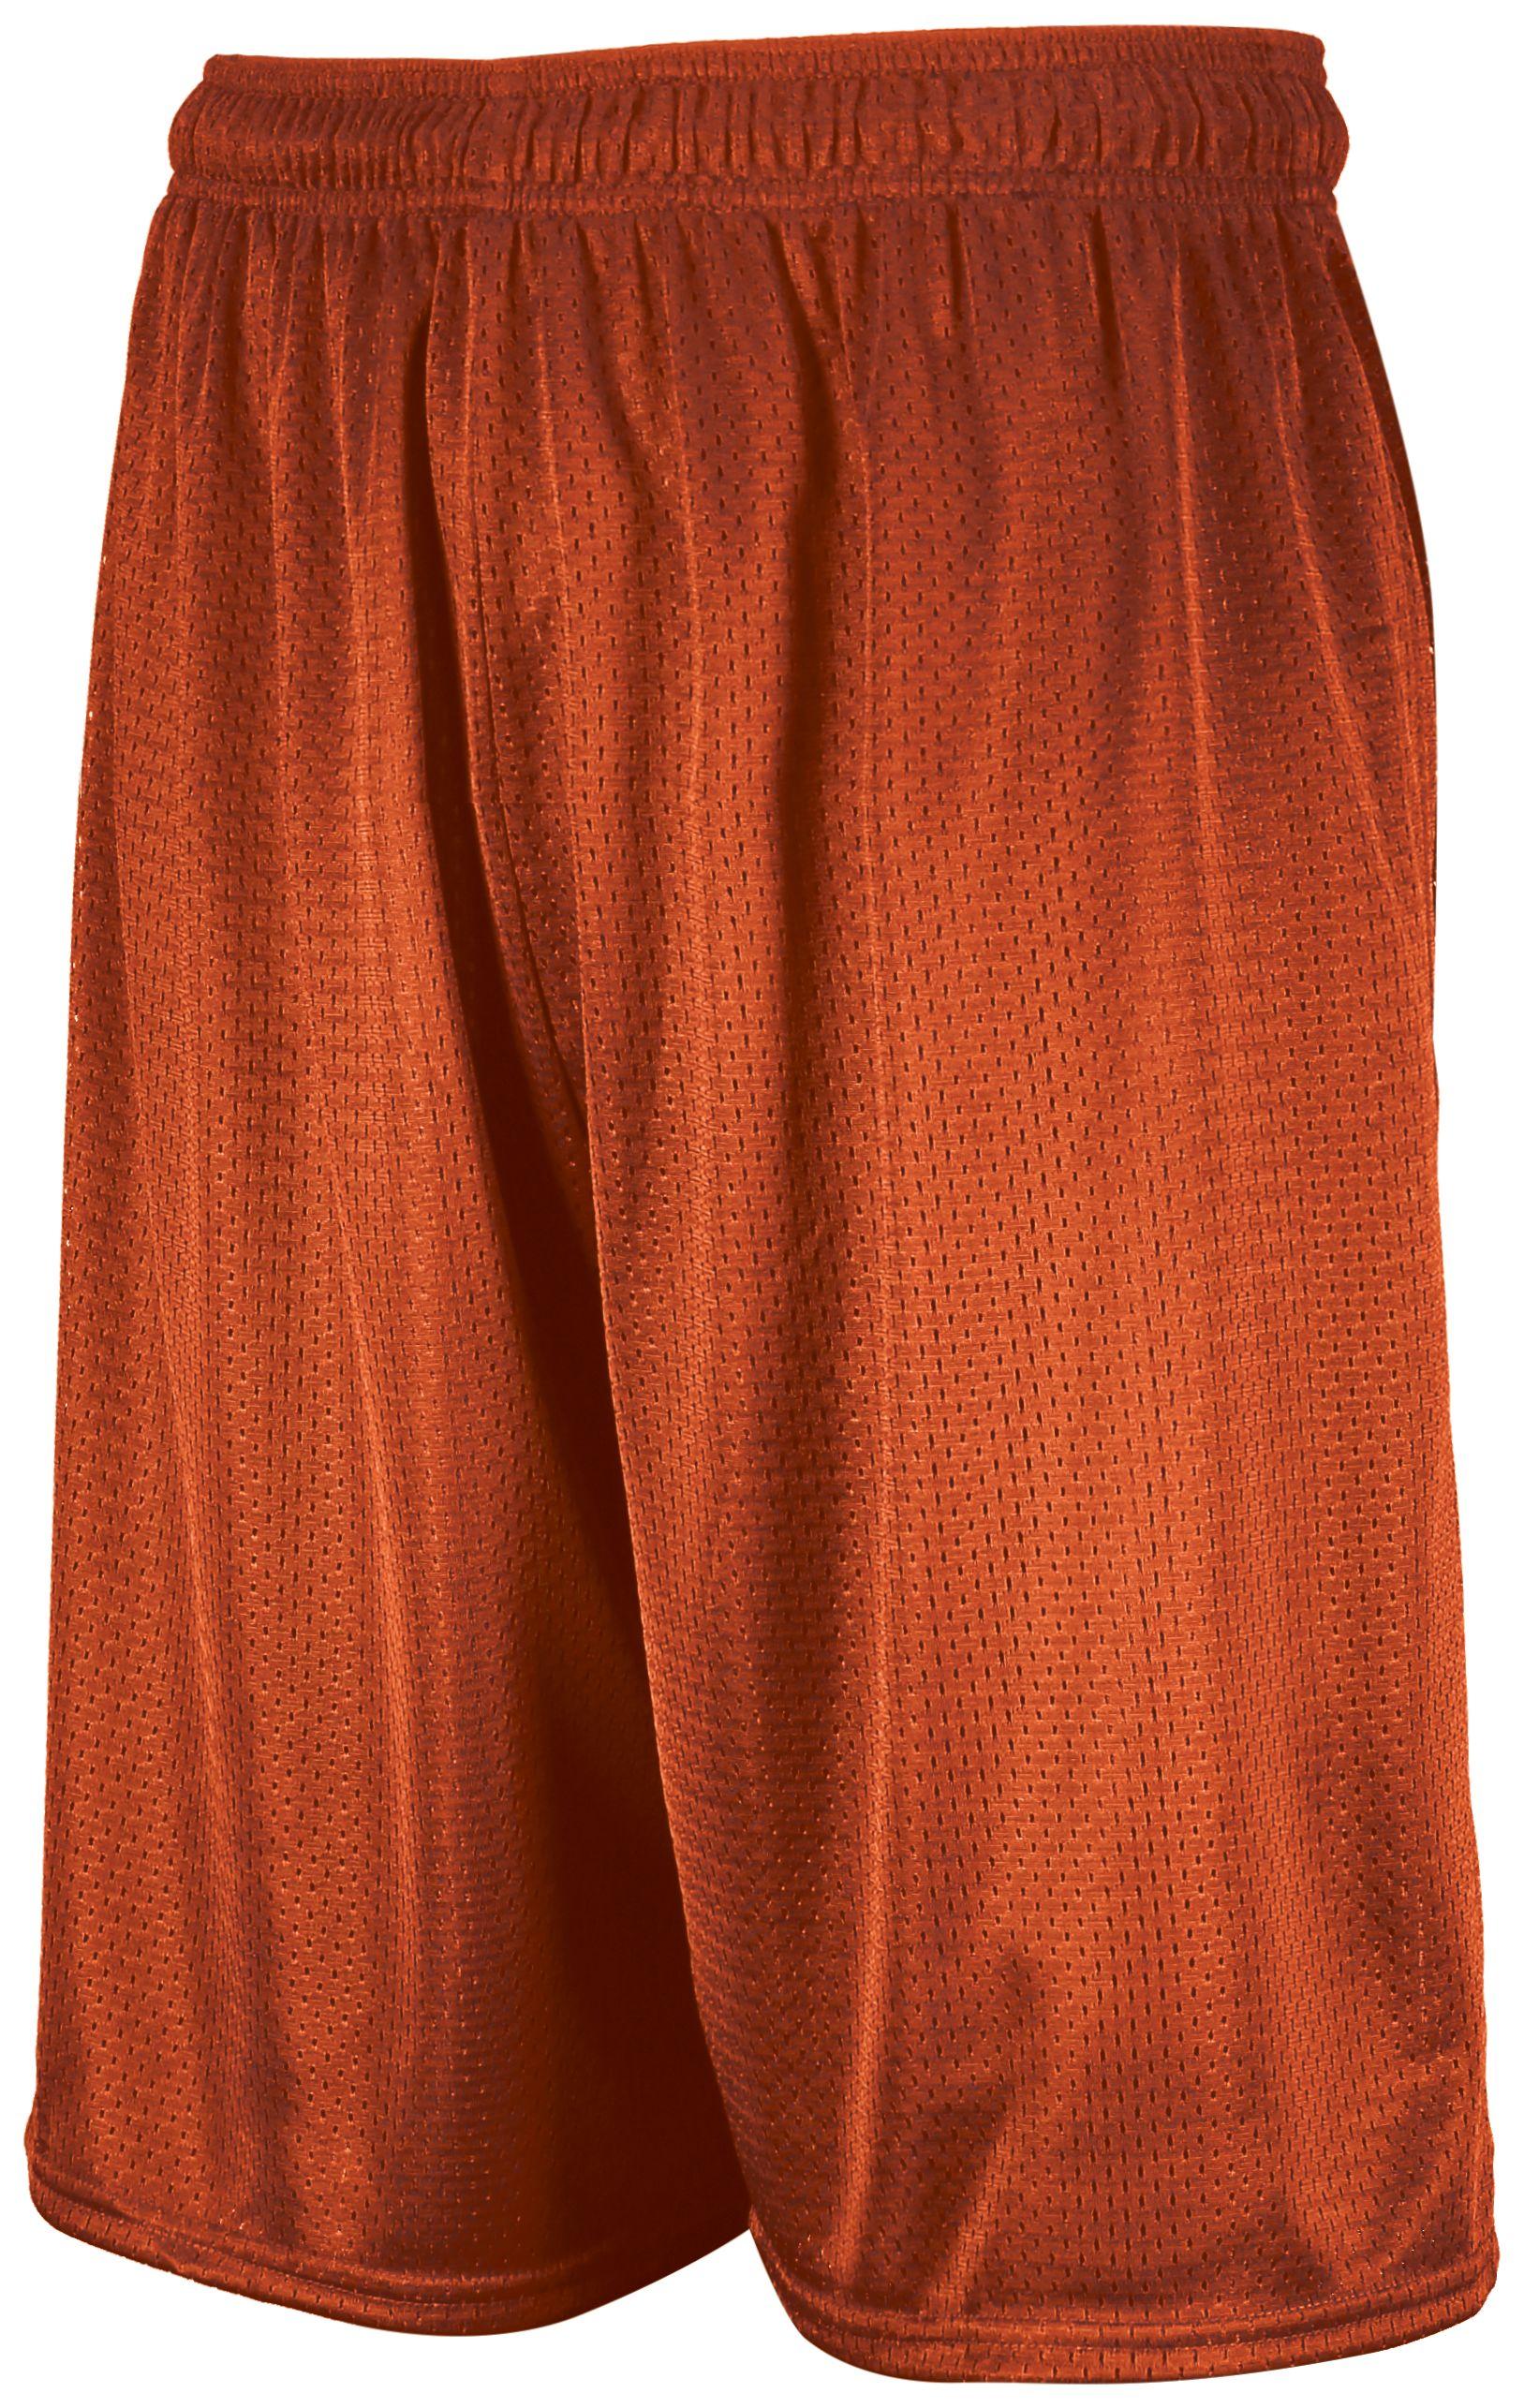 Dri-Power Mesh Shorts - Burnt Orange